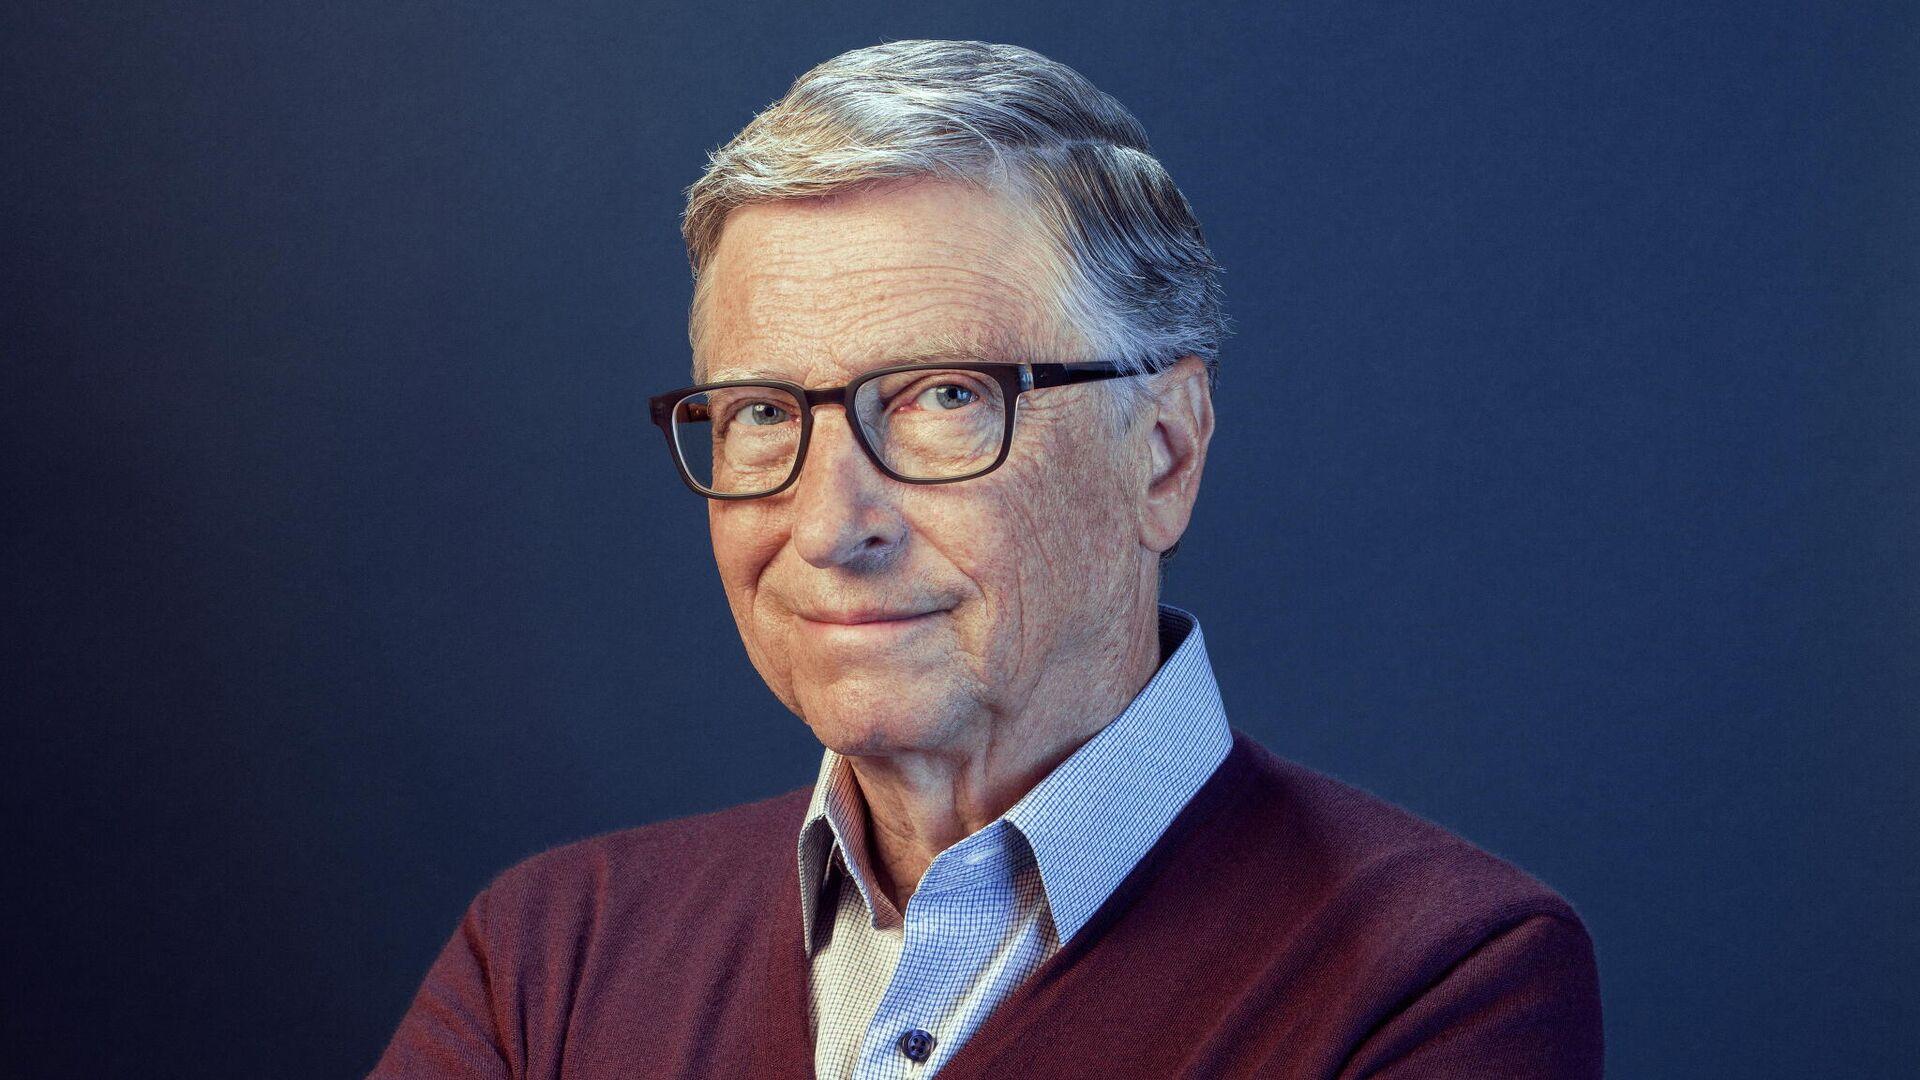 Bill Gates, cofundador de Microsoft - Sputnik Mundo, 1920, 01.03.2021